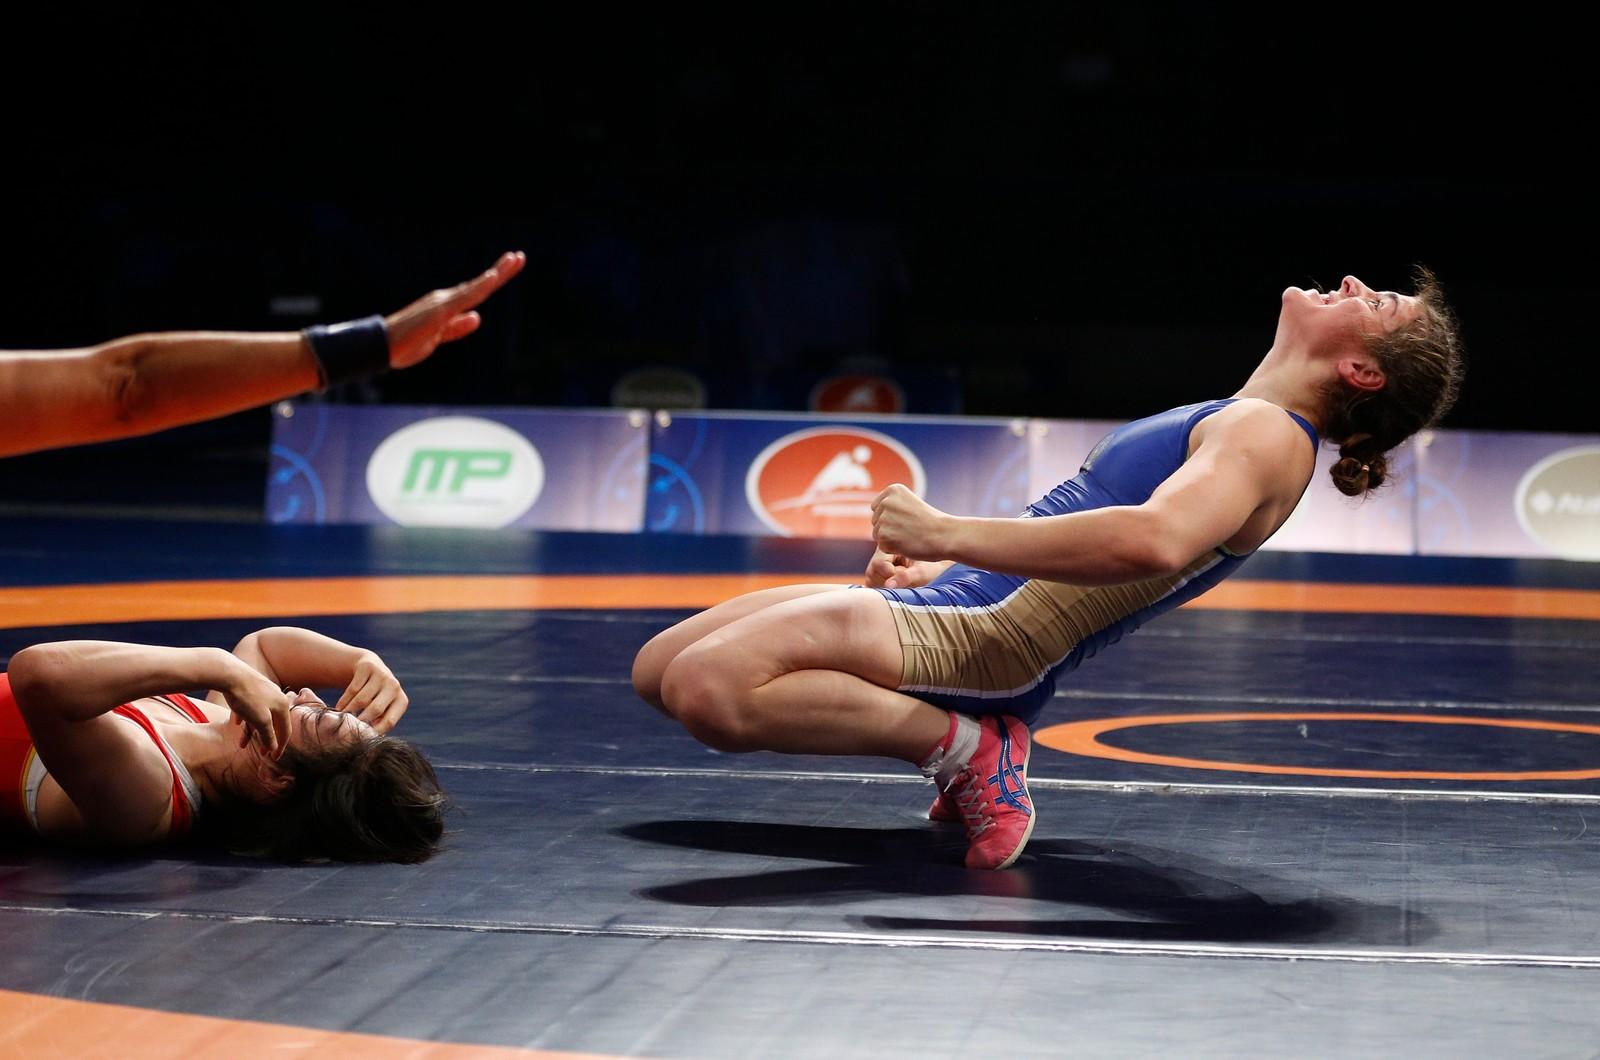 Russiske Natalia Vorobeva jubler over seieren i bryte-VM i Las Vegas. I finalen slo hun kinesiske Zhou Feng i 69 kilo-klassen.